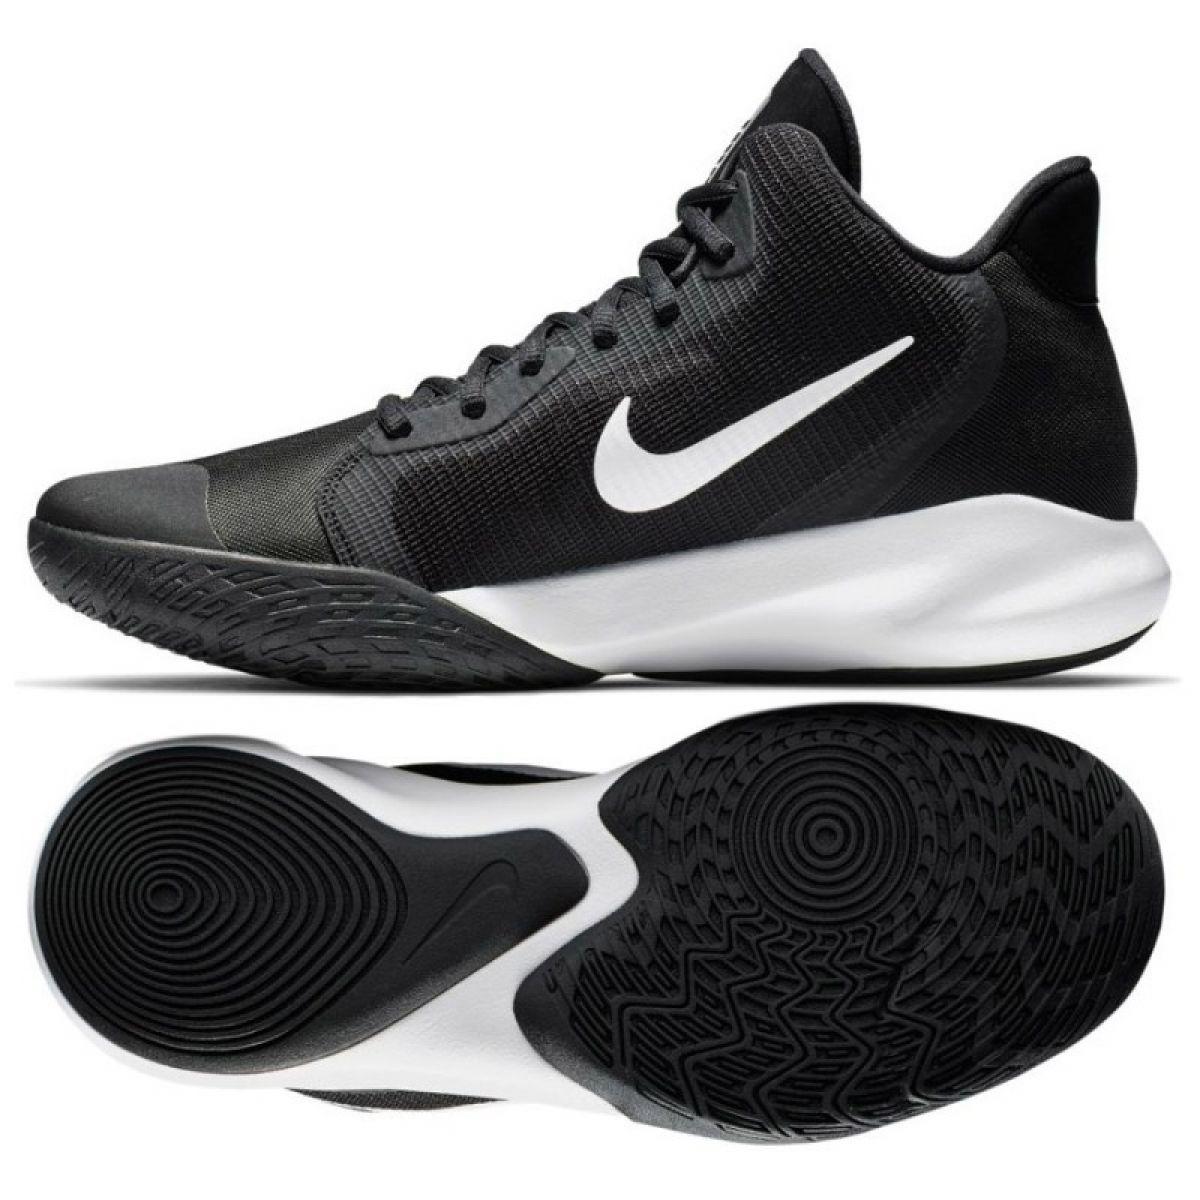 sito affidabile 9b408 c3844 Scarpe da basket Nike Precision Iii M AQ7495 002 nere